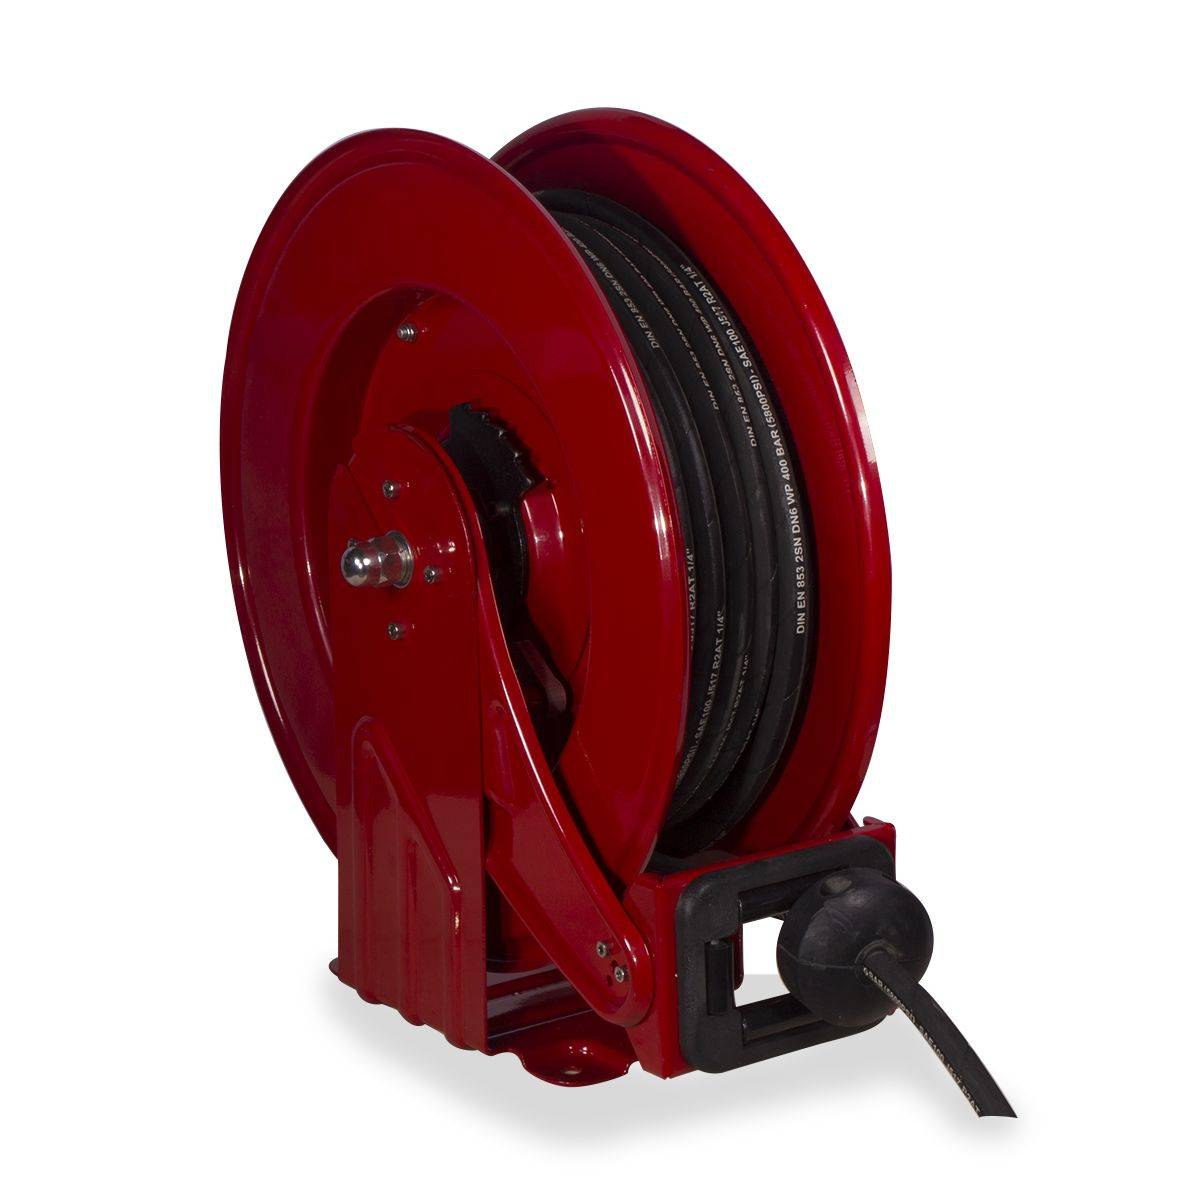 Mw-tools Enrouleur graisse 15 m - 1/4 MW-Tools SHV1415